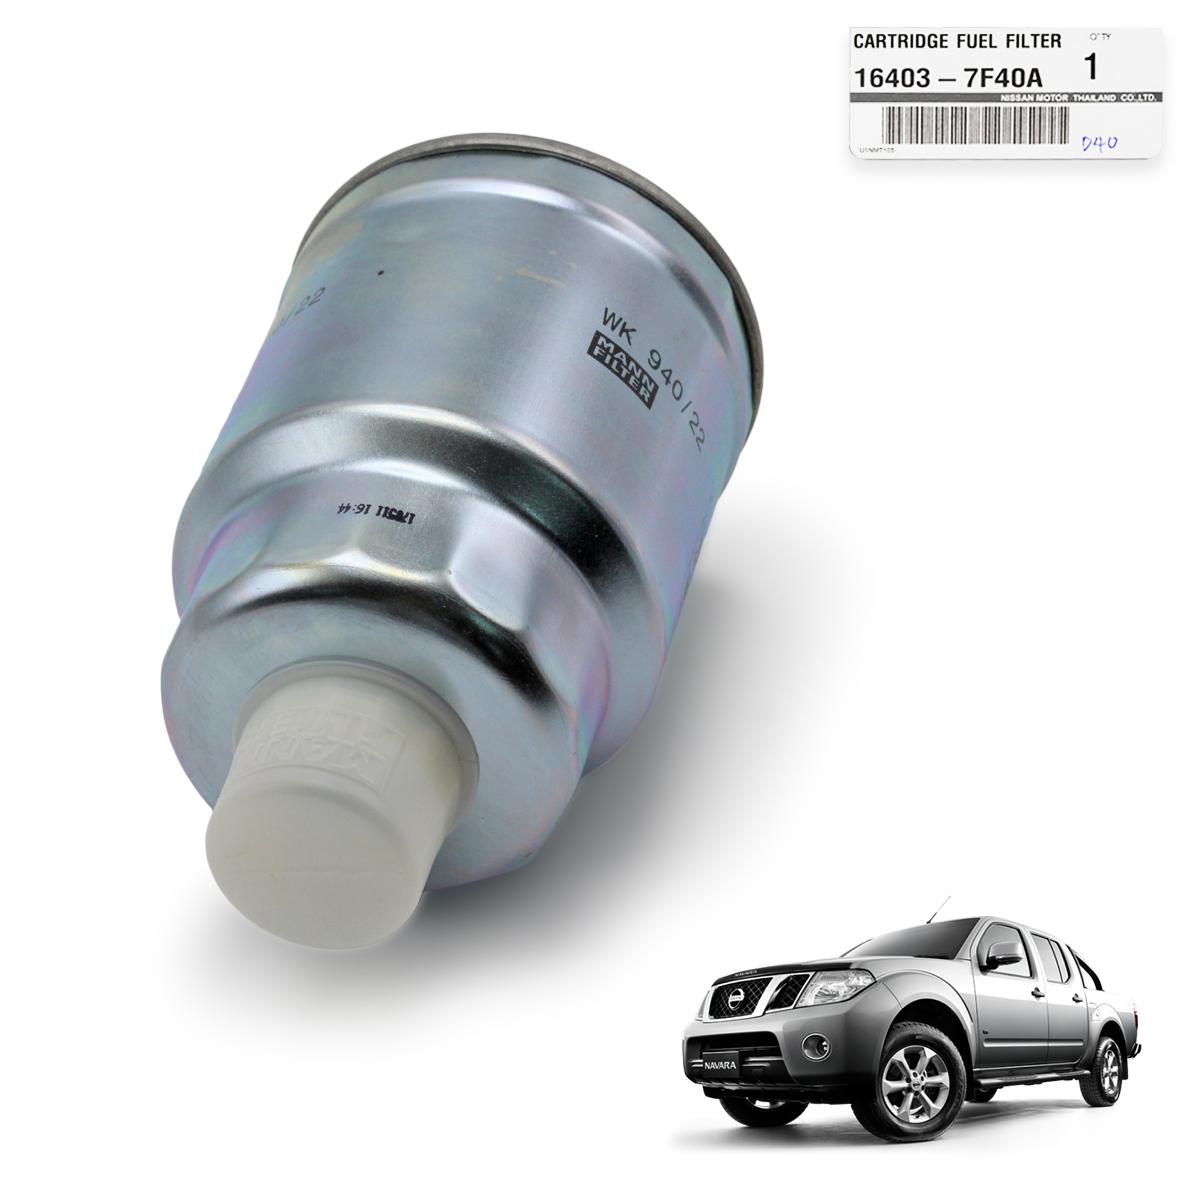 Genuine Cartridge Fuel Filter Silver Fits Nissan Navara Frontier D40 Juke Location